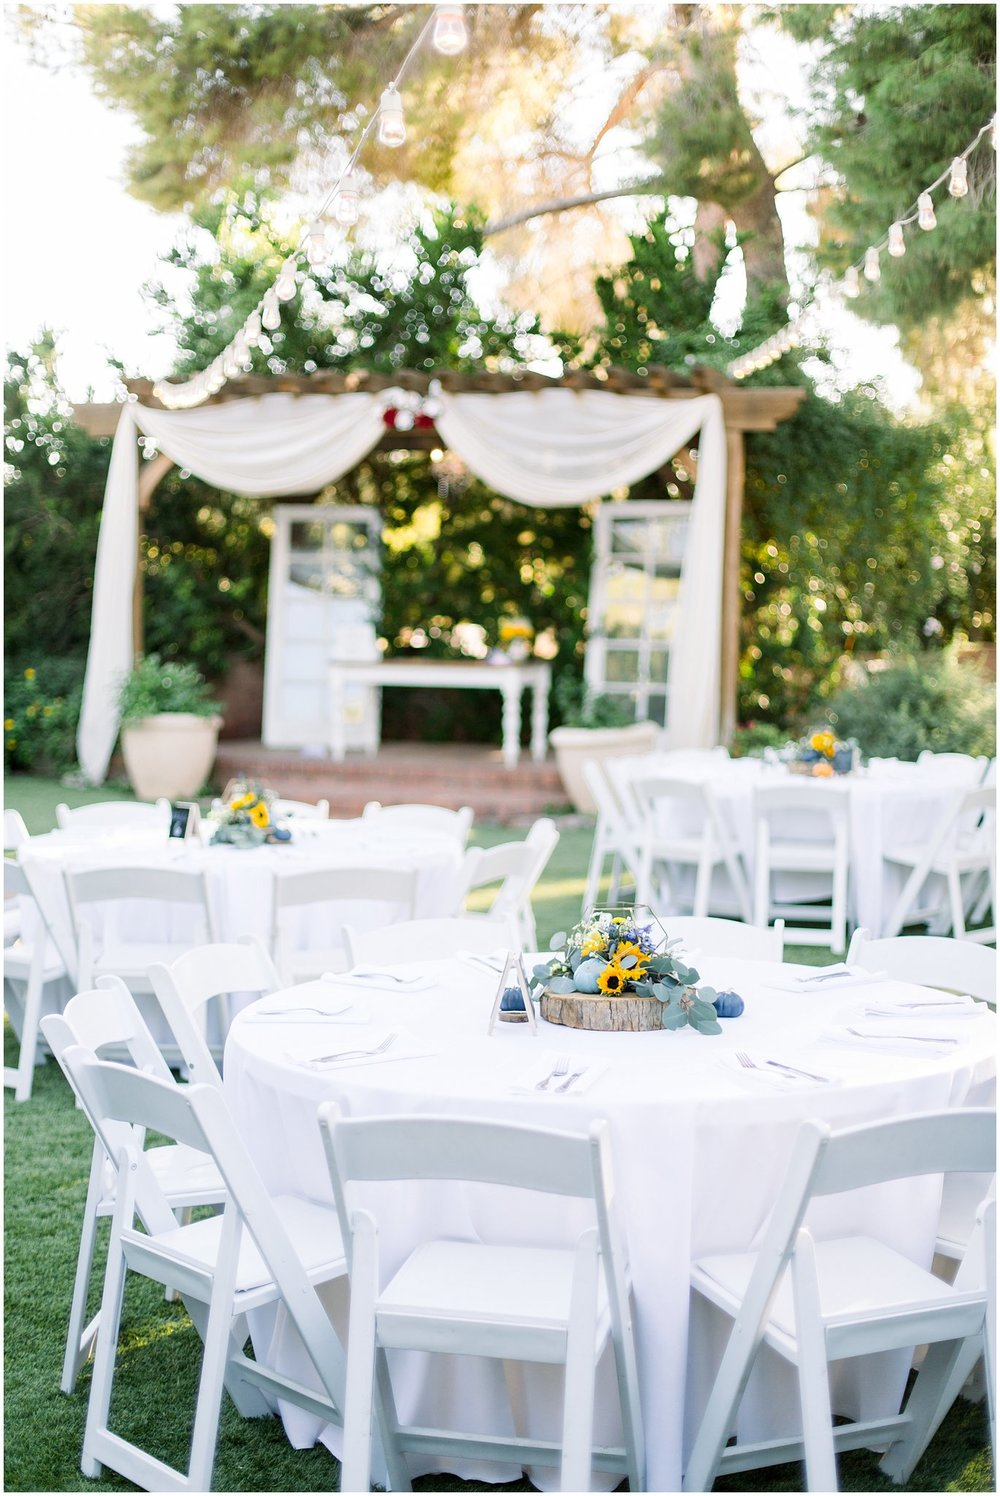 Hyatt-Lodge-Mcdonald-Campus-Wedding_0128.jpg